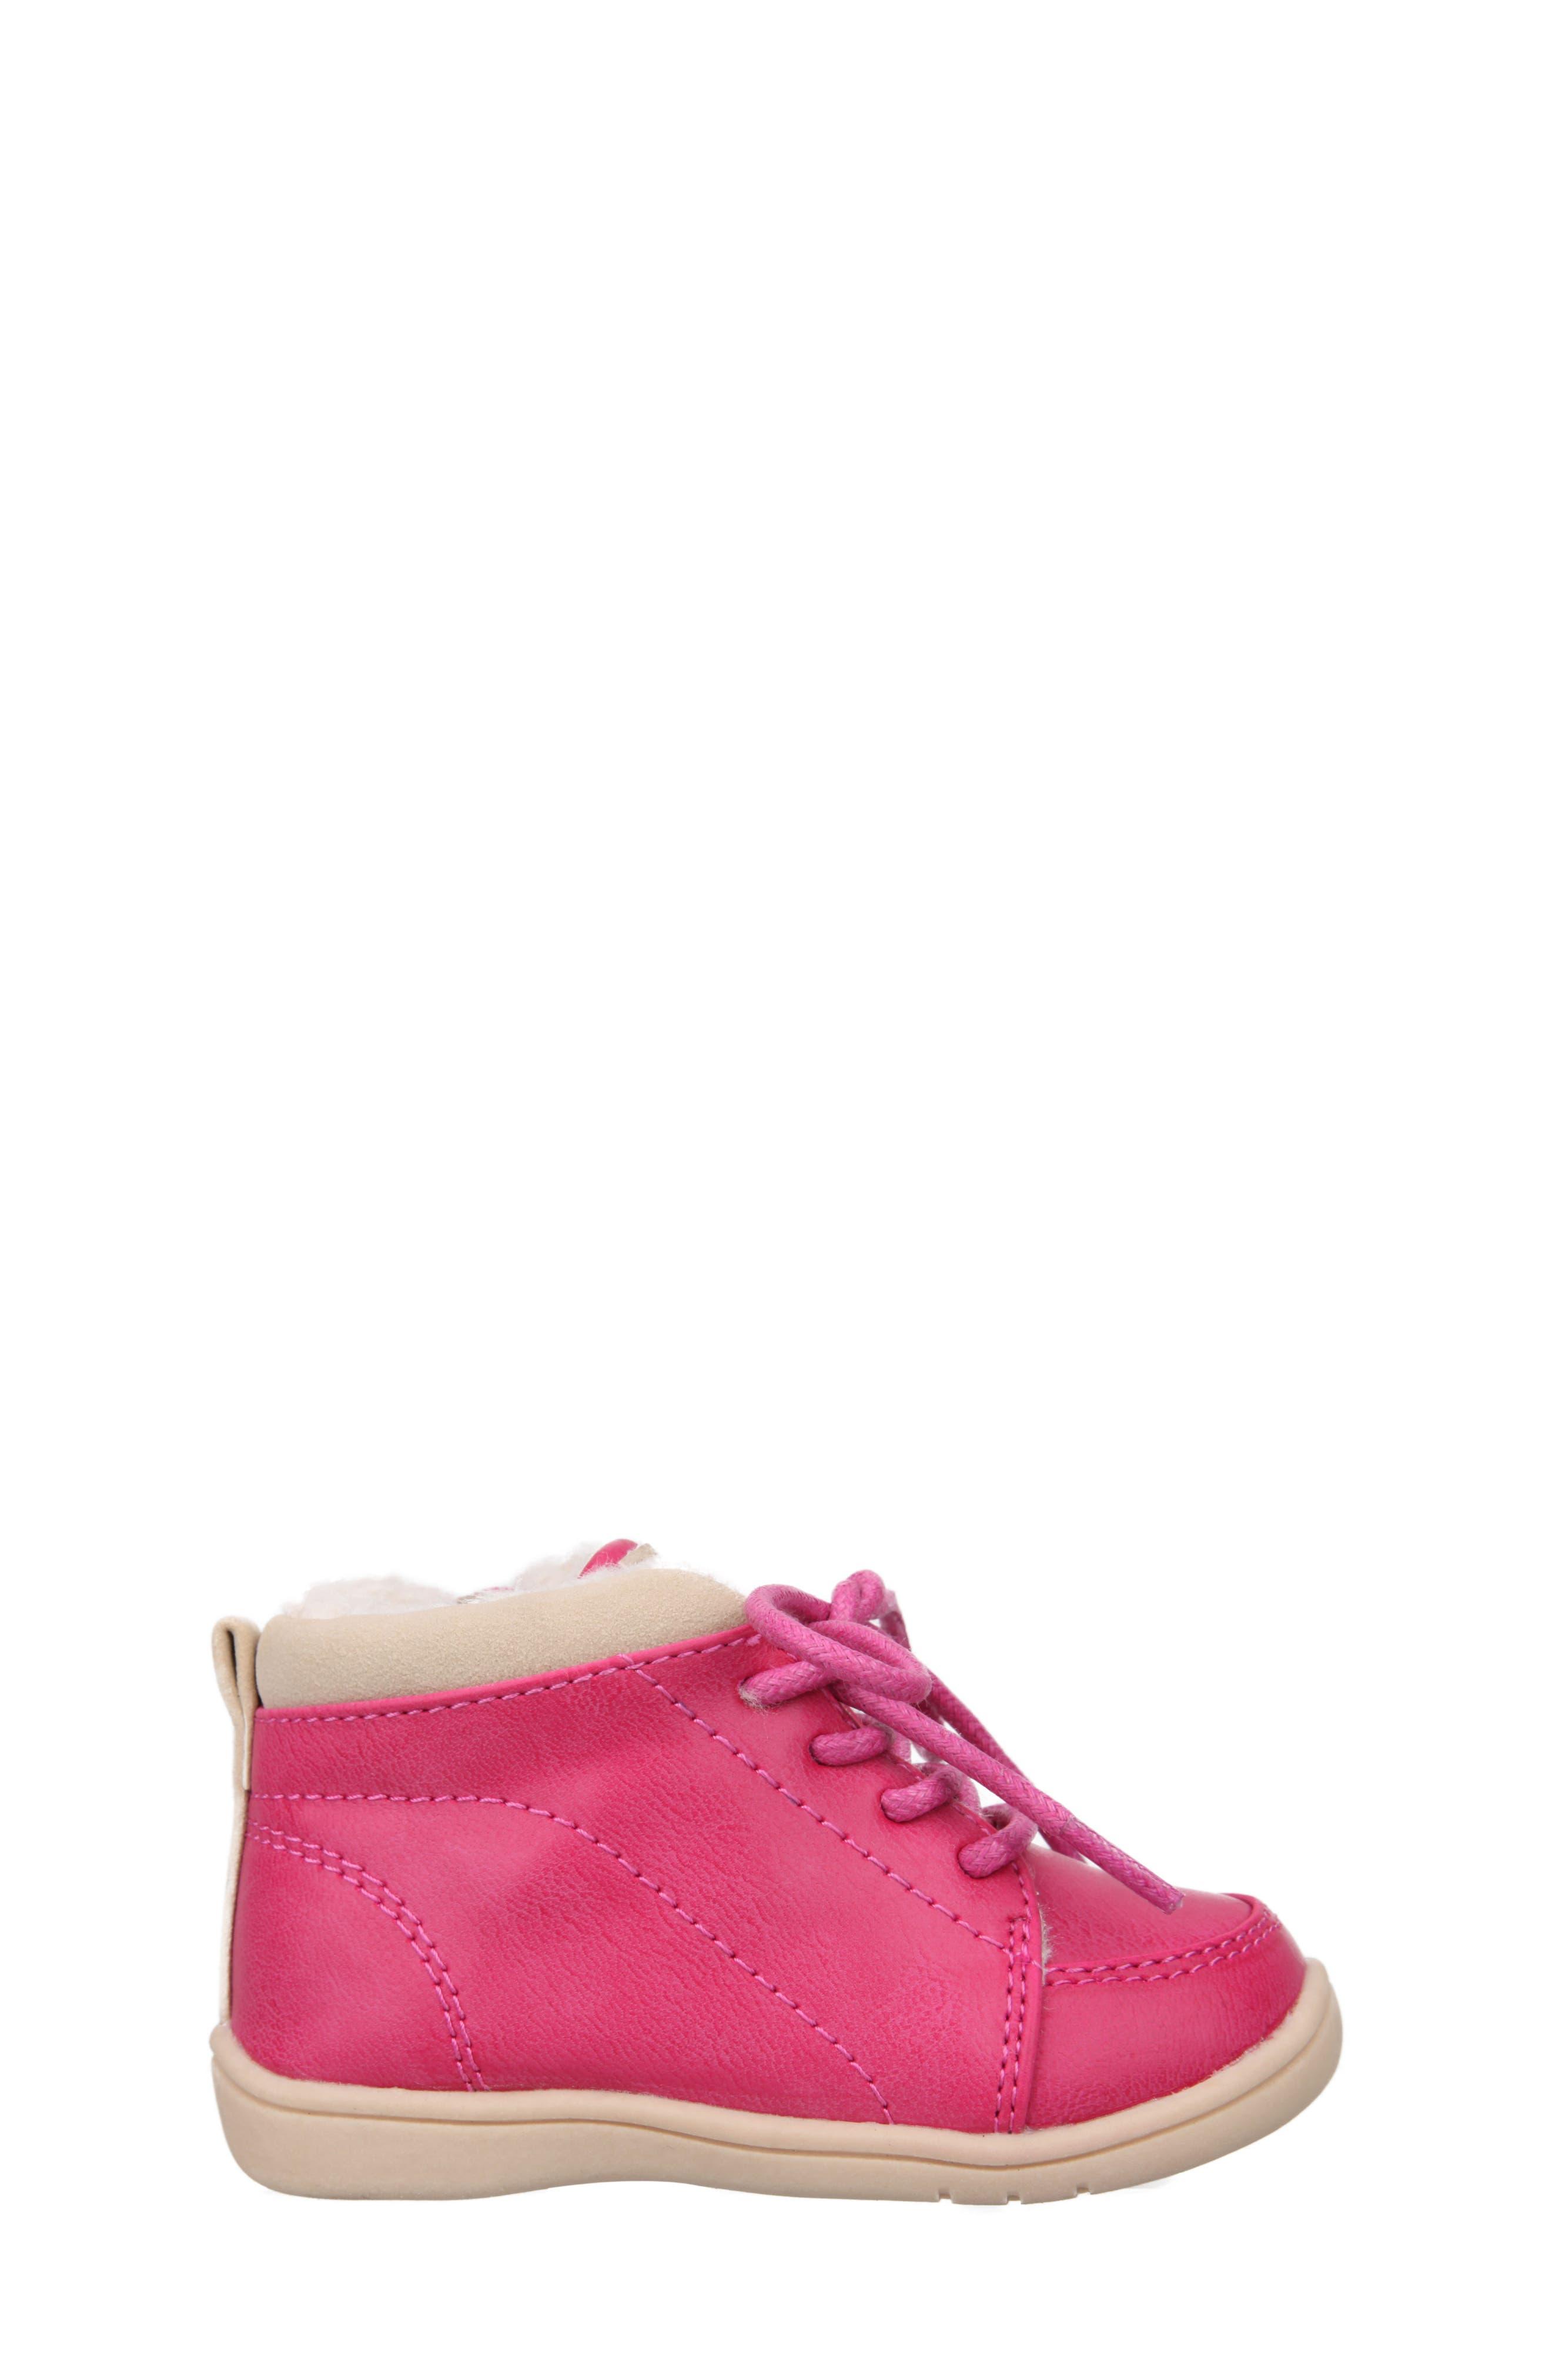 Alternate Image 3  - Nina Mobility Moe Sneaker (Baby & Walker)